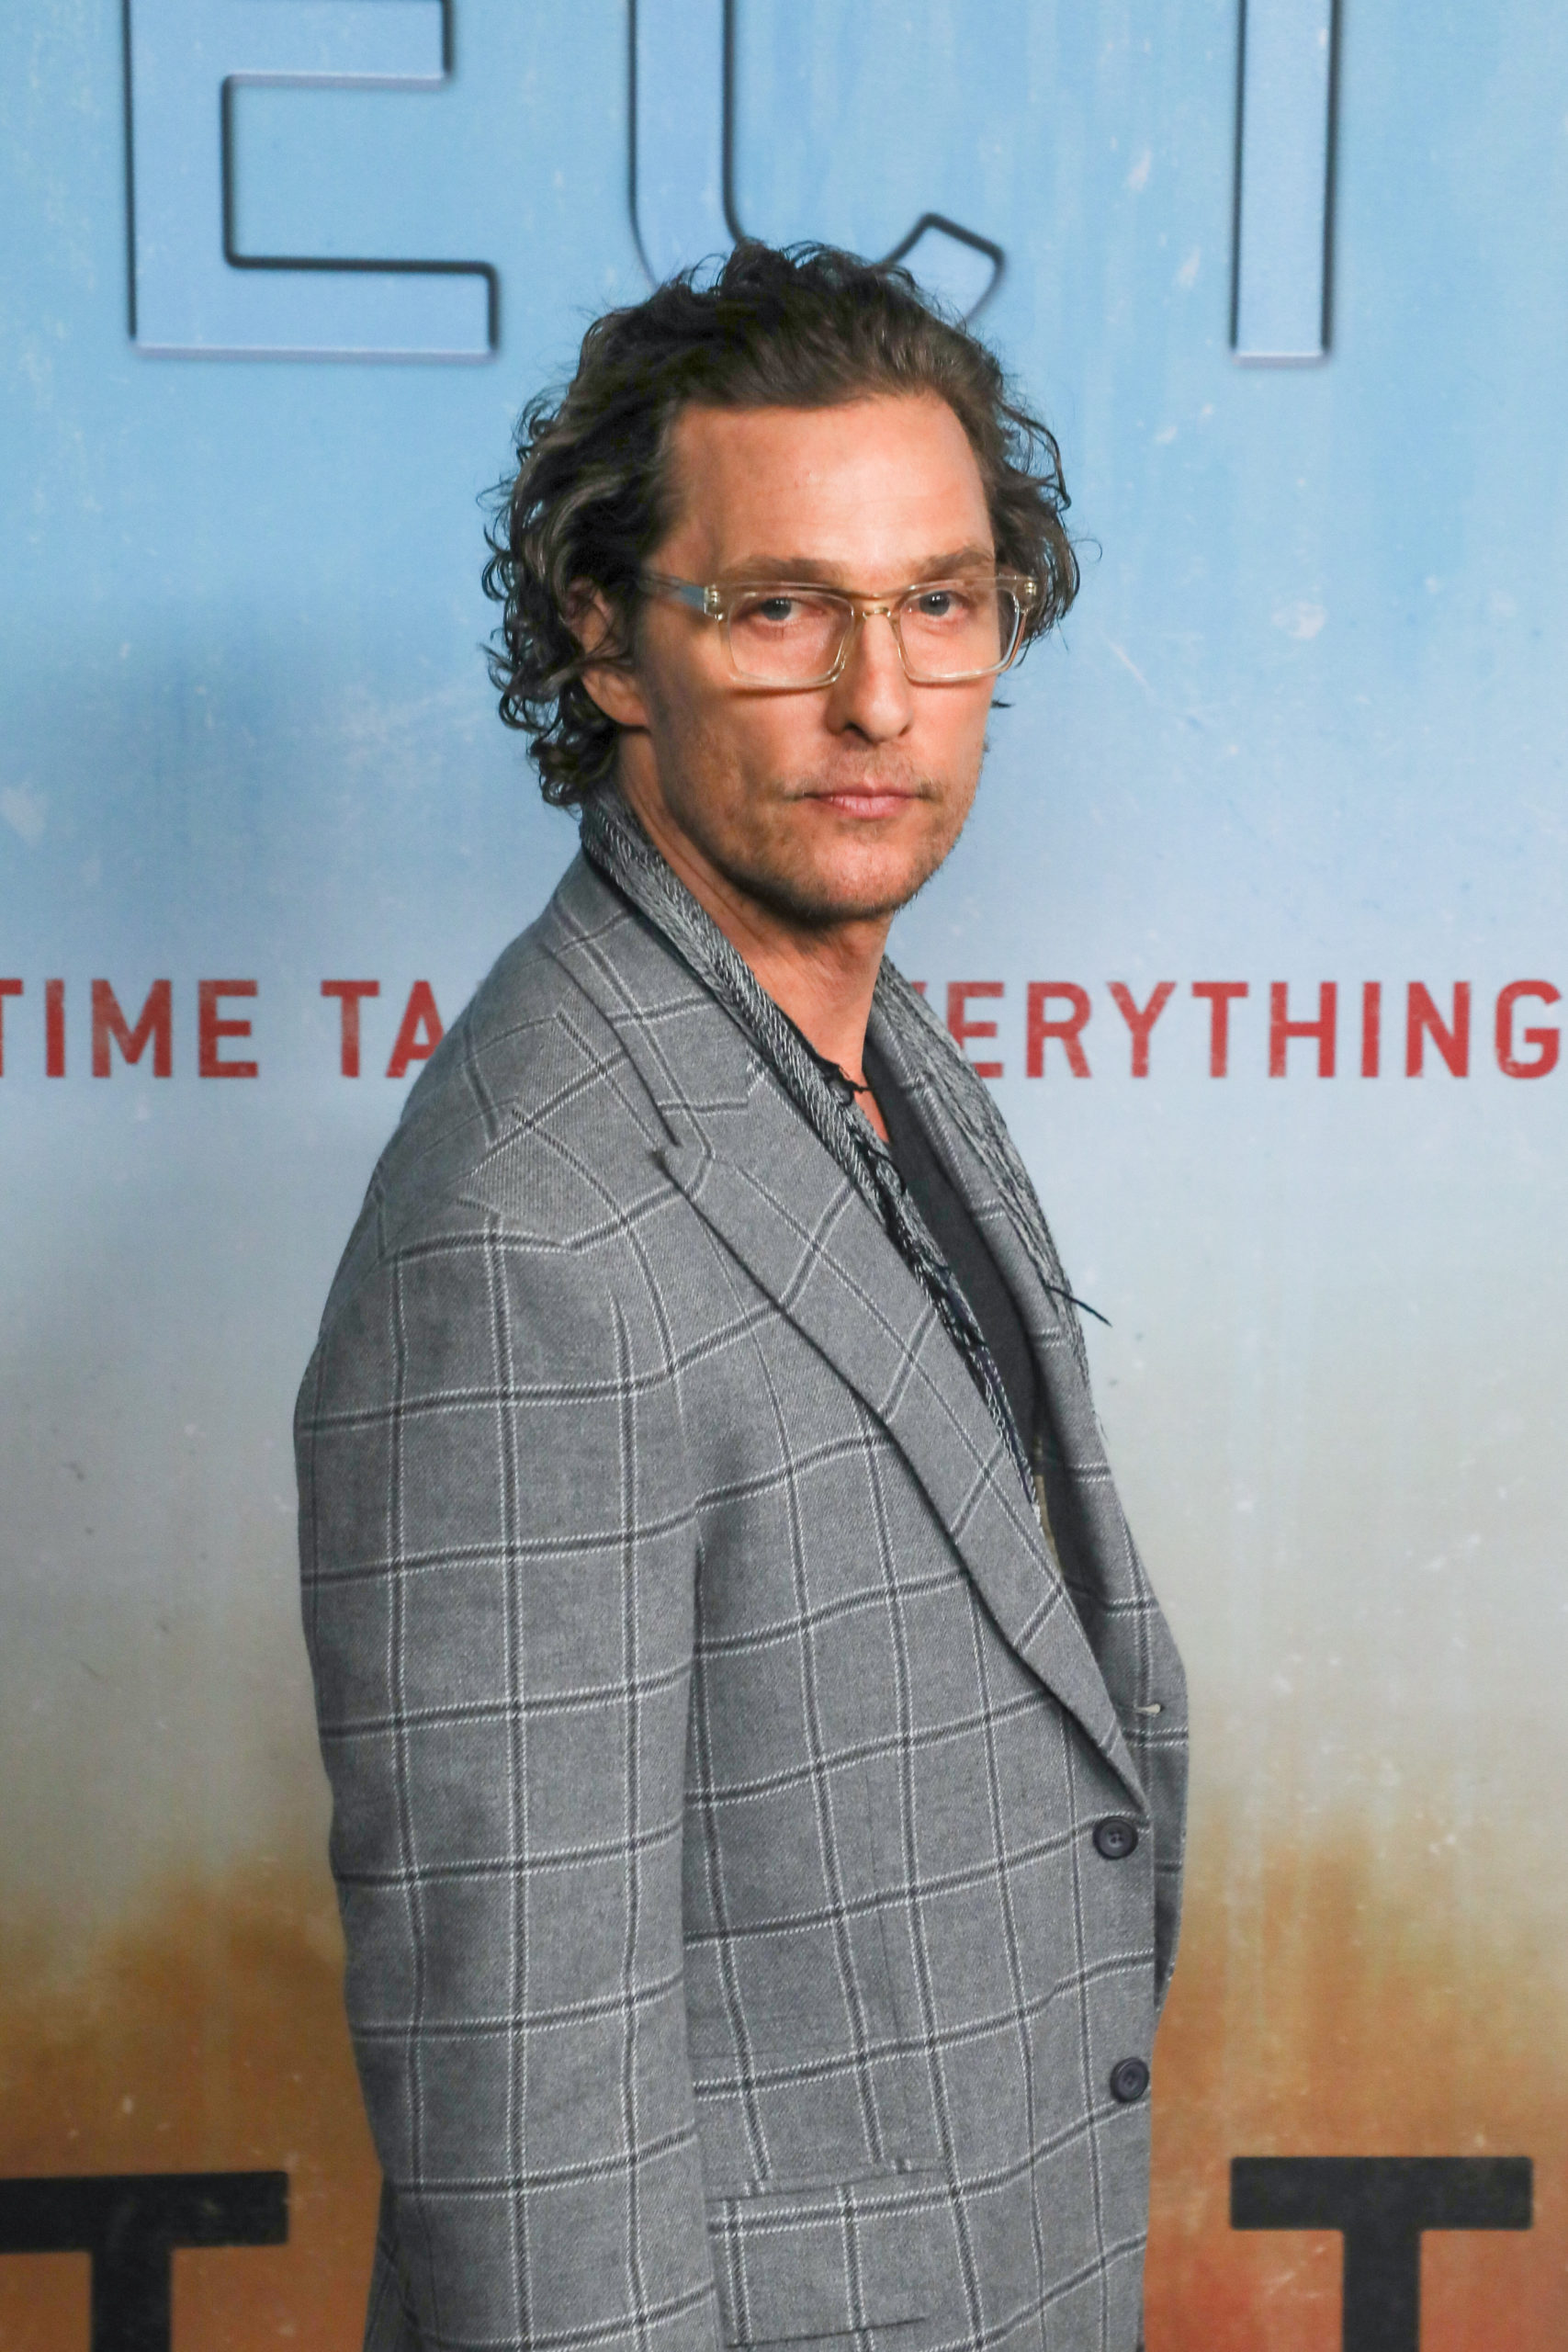 Matthew McConaughey Reacts To His Iconic 'Bongo Naked' Man Moment